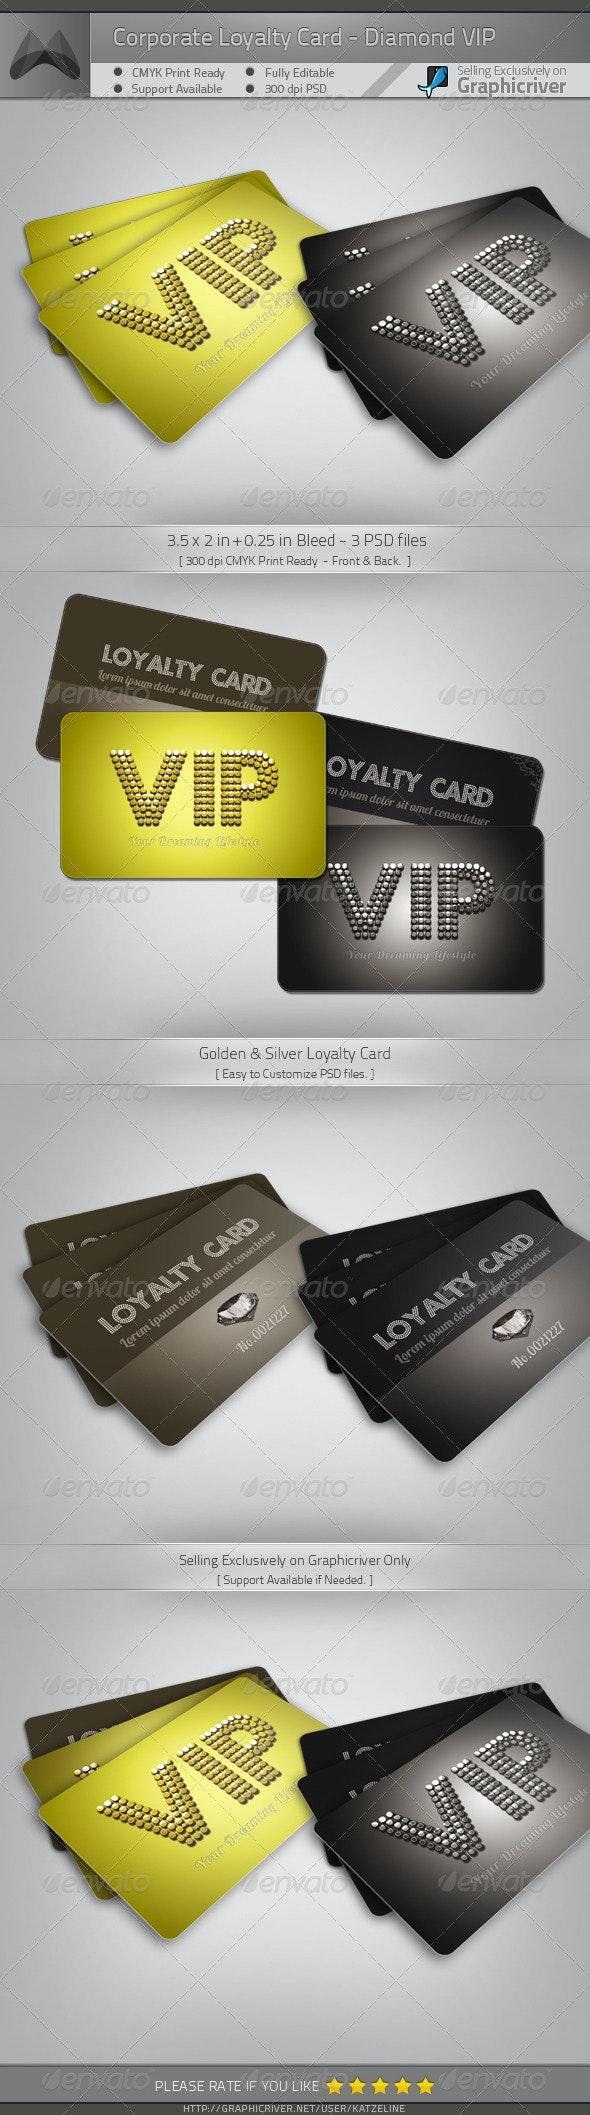 VIP Card Template - Diamond - Miscellaneous Print Templates